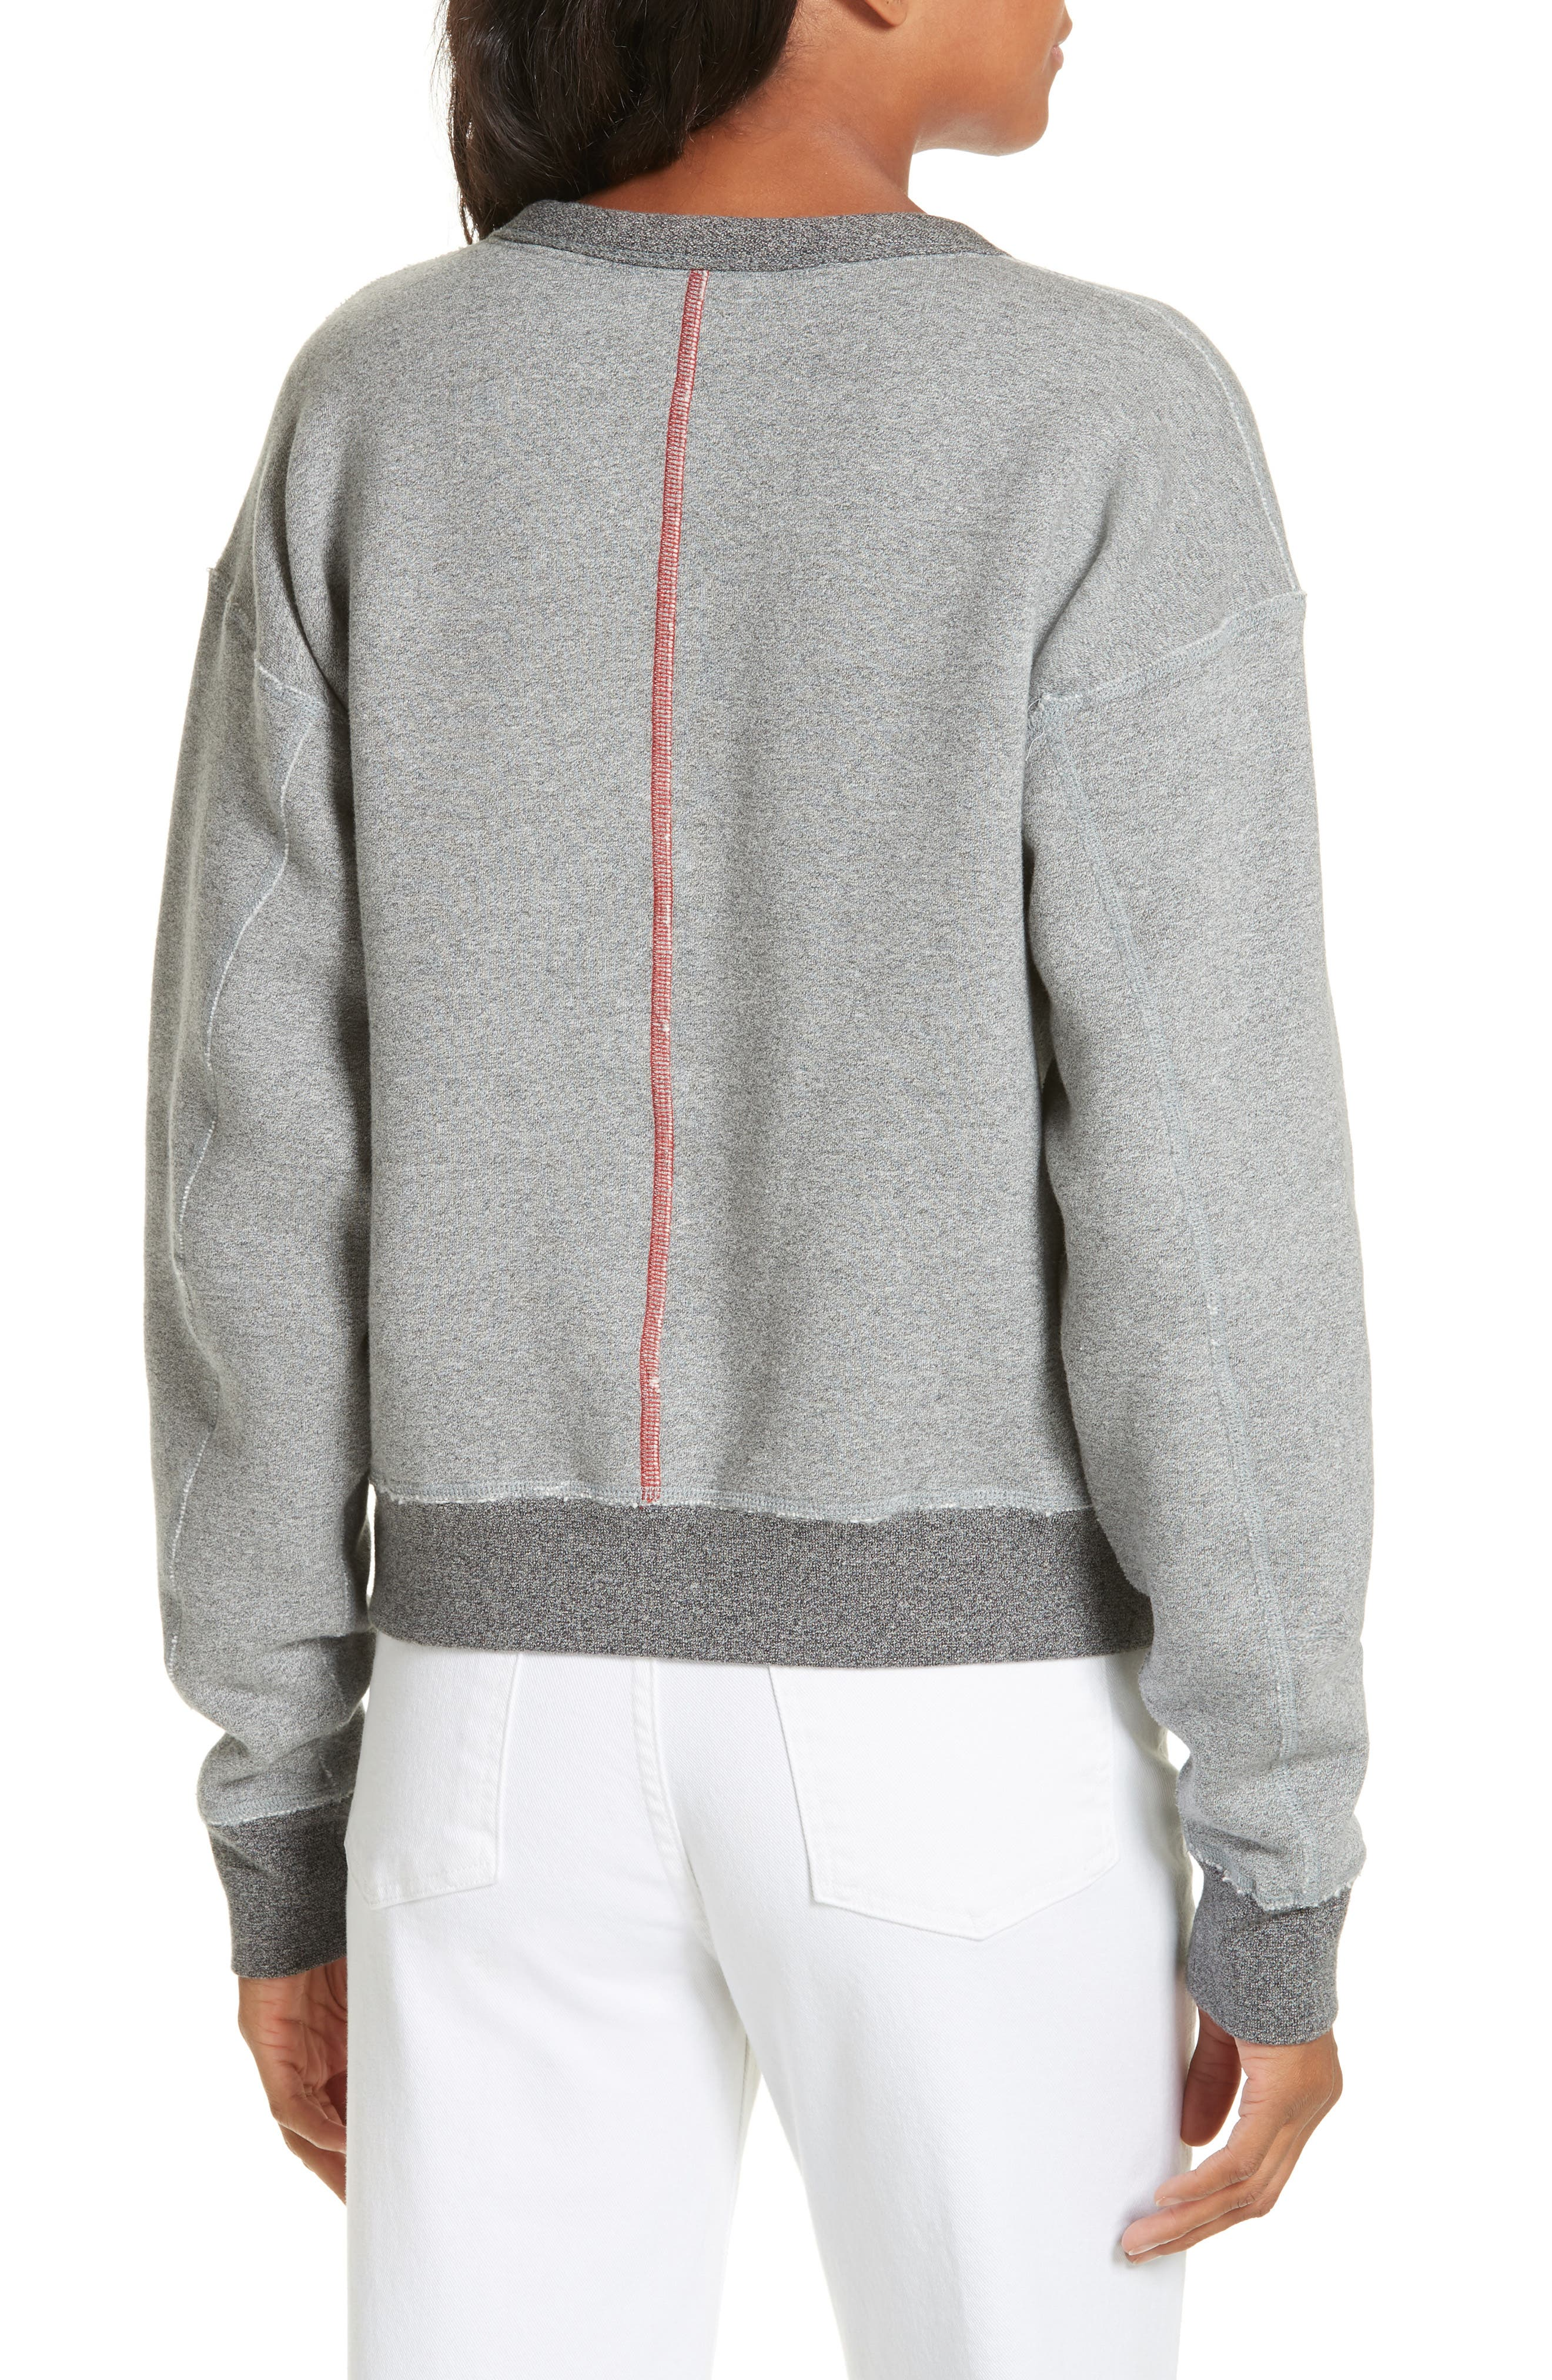 rag & bone Best Sweatshirt,                             Alternate thumbnail 2, color,                             HEATHER GREY